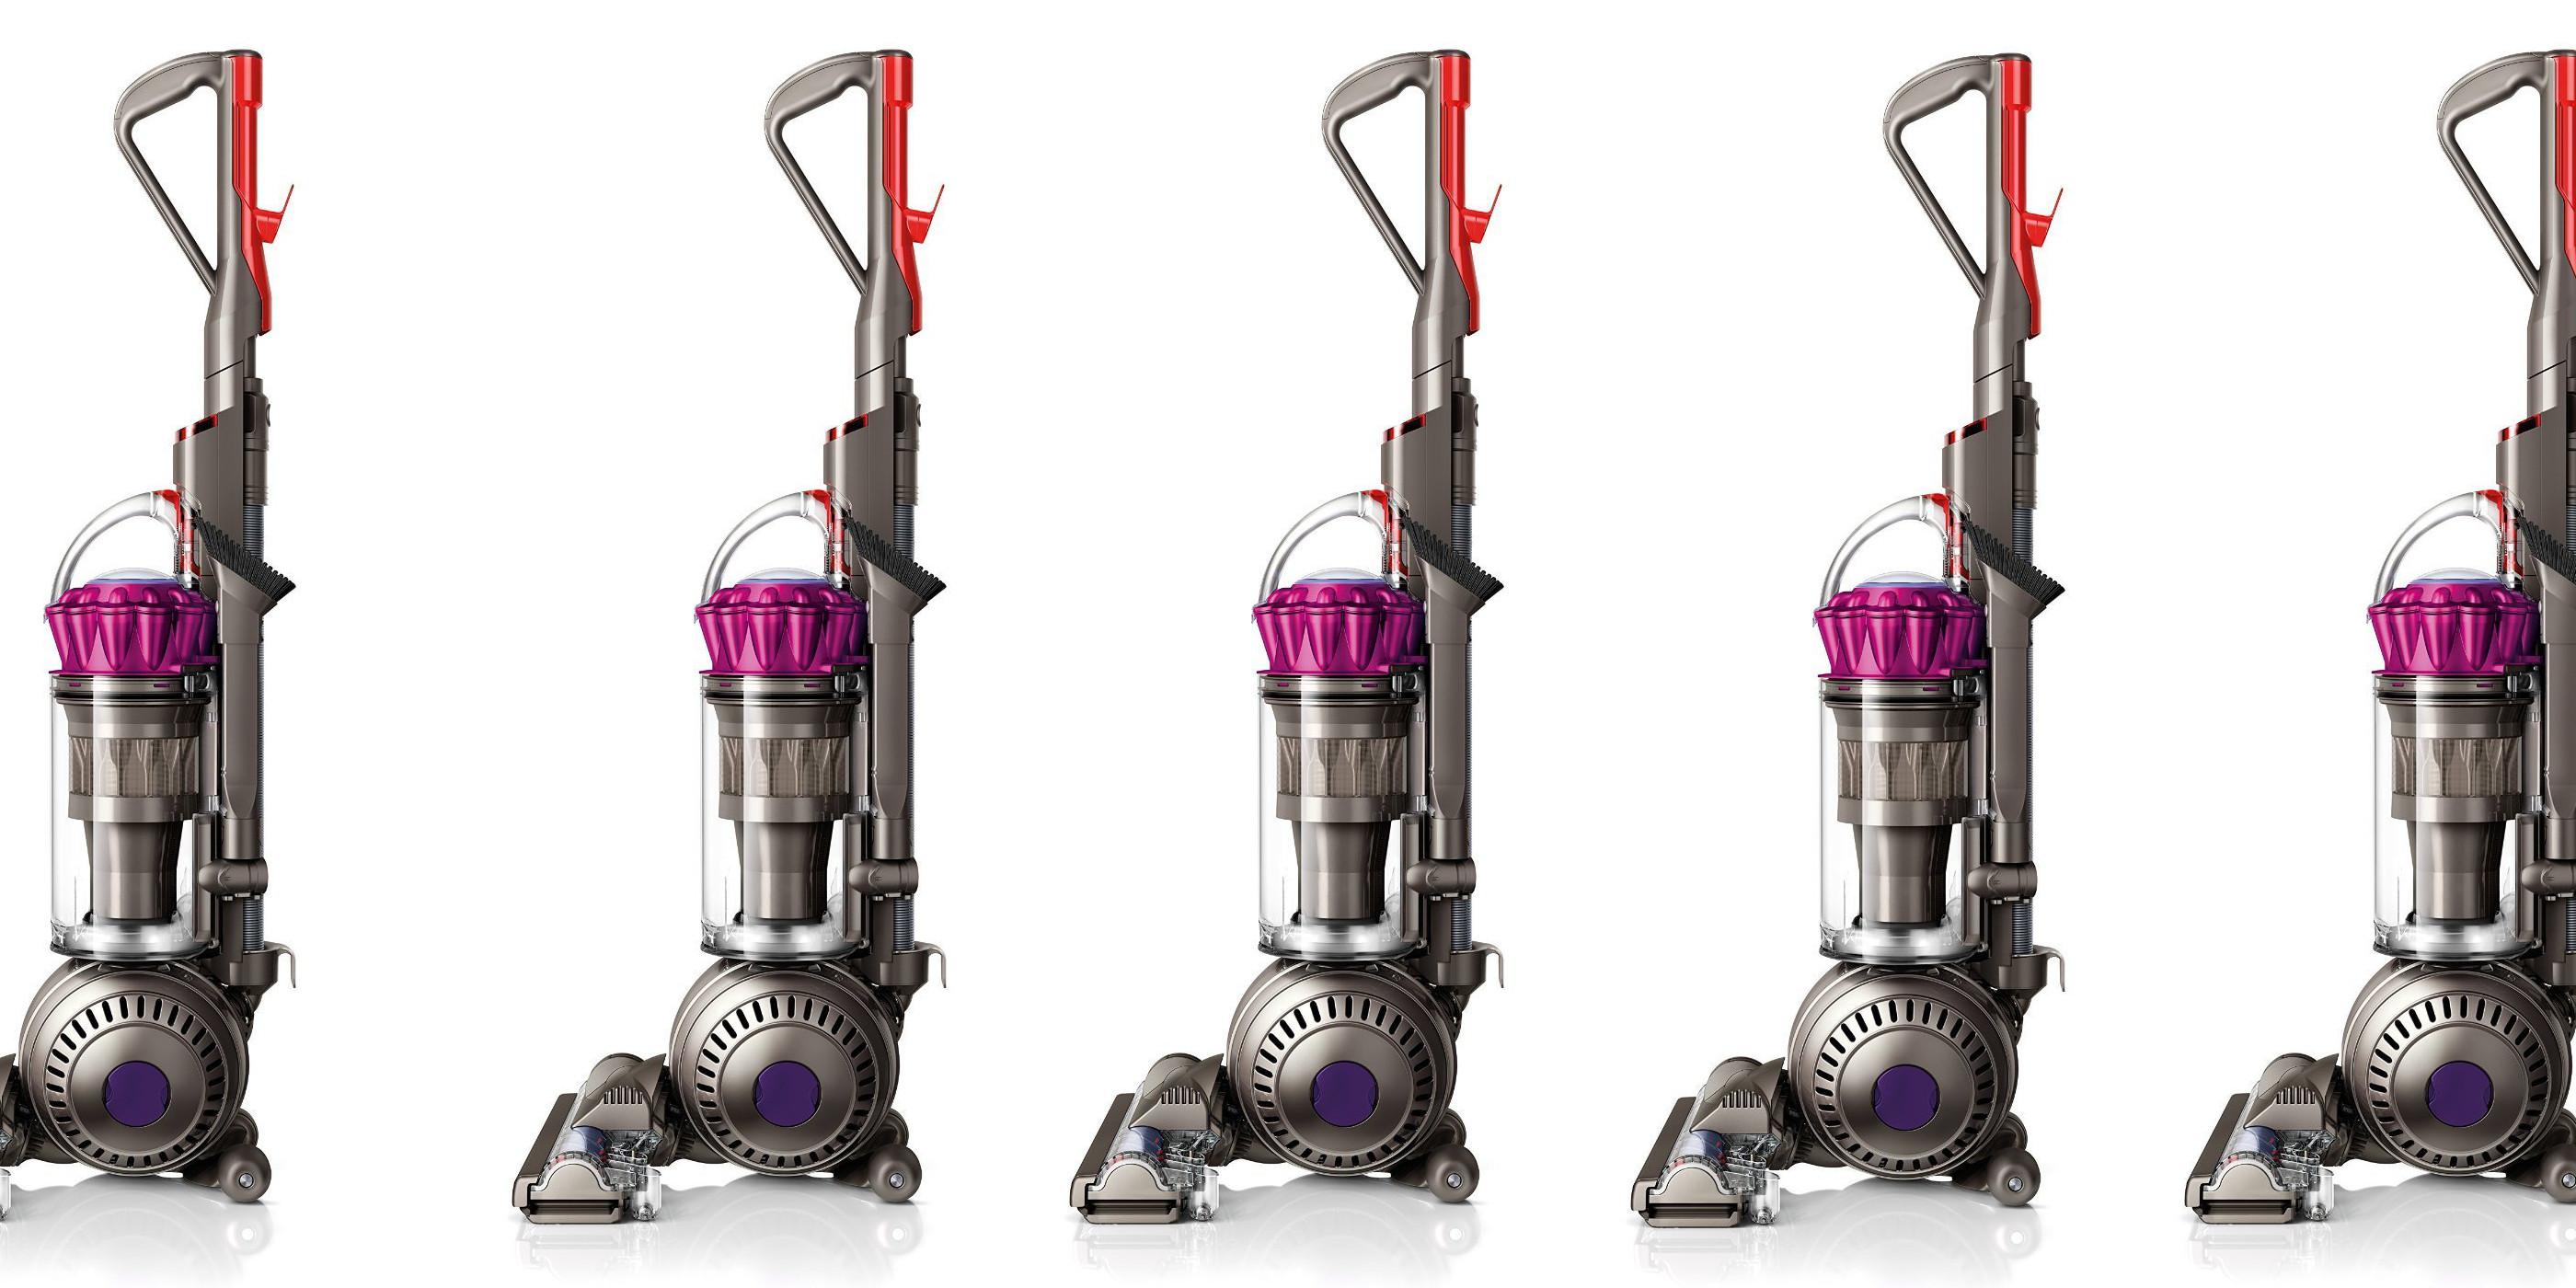 dyson ball vacuum refurbished